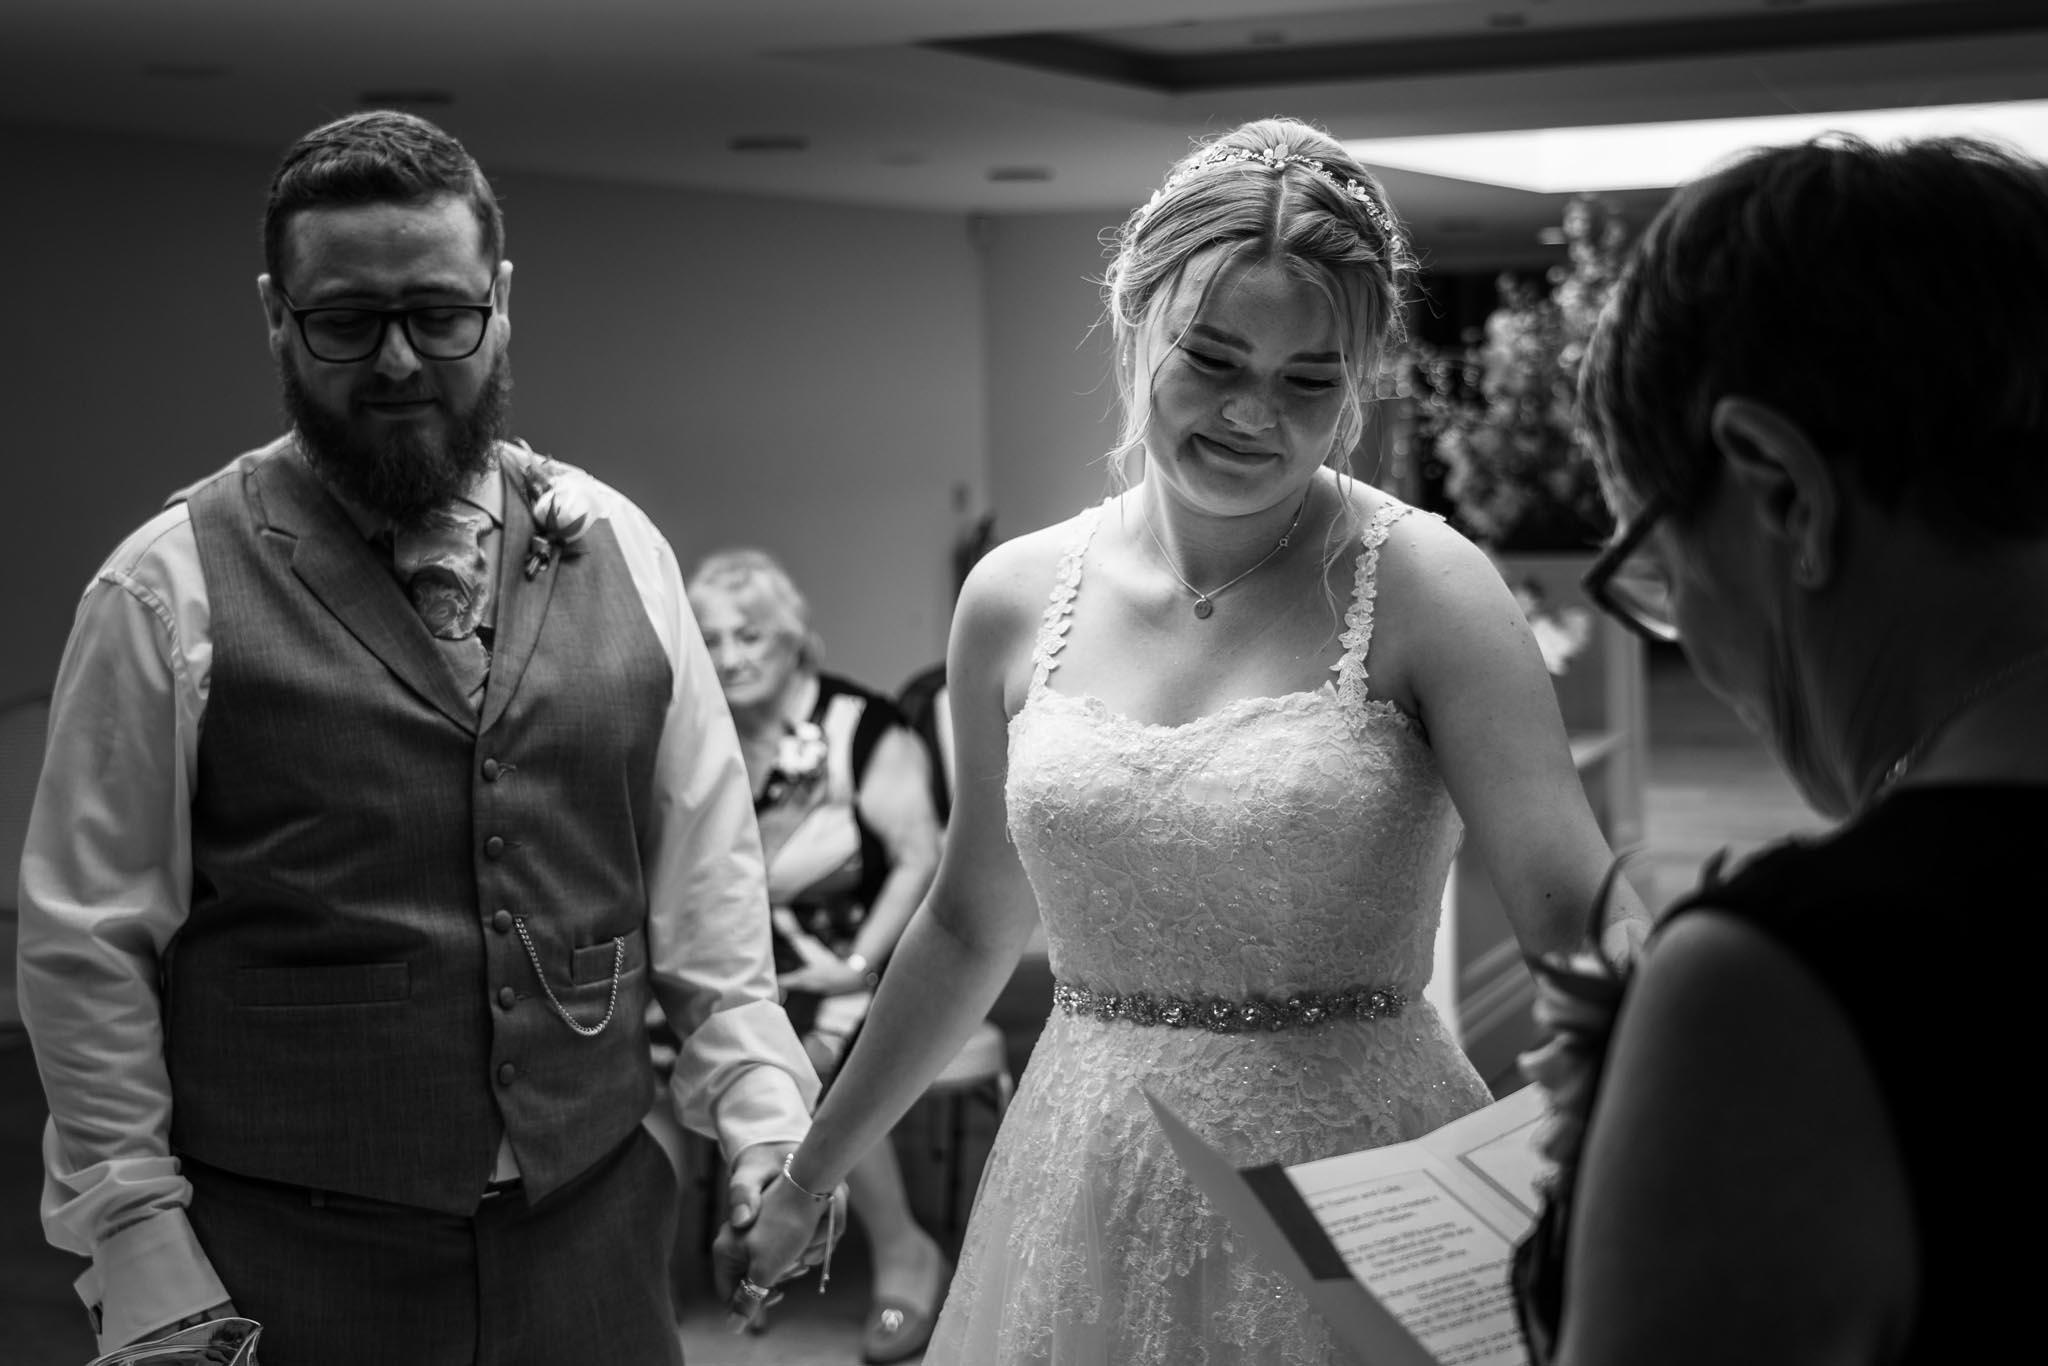 370-Ceremony-Luke-Yasmin-The-Rayleigh-Club-Wedding-Photography.jpg